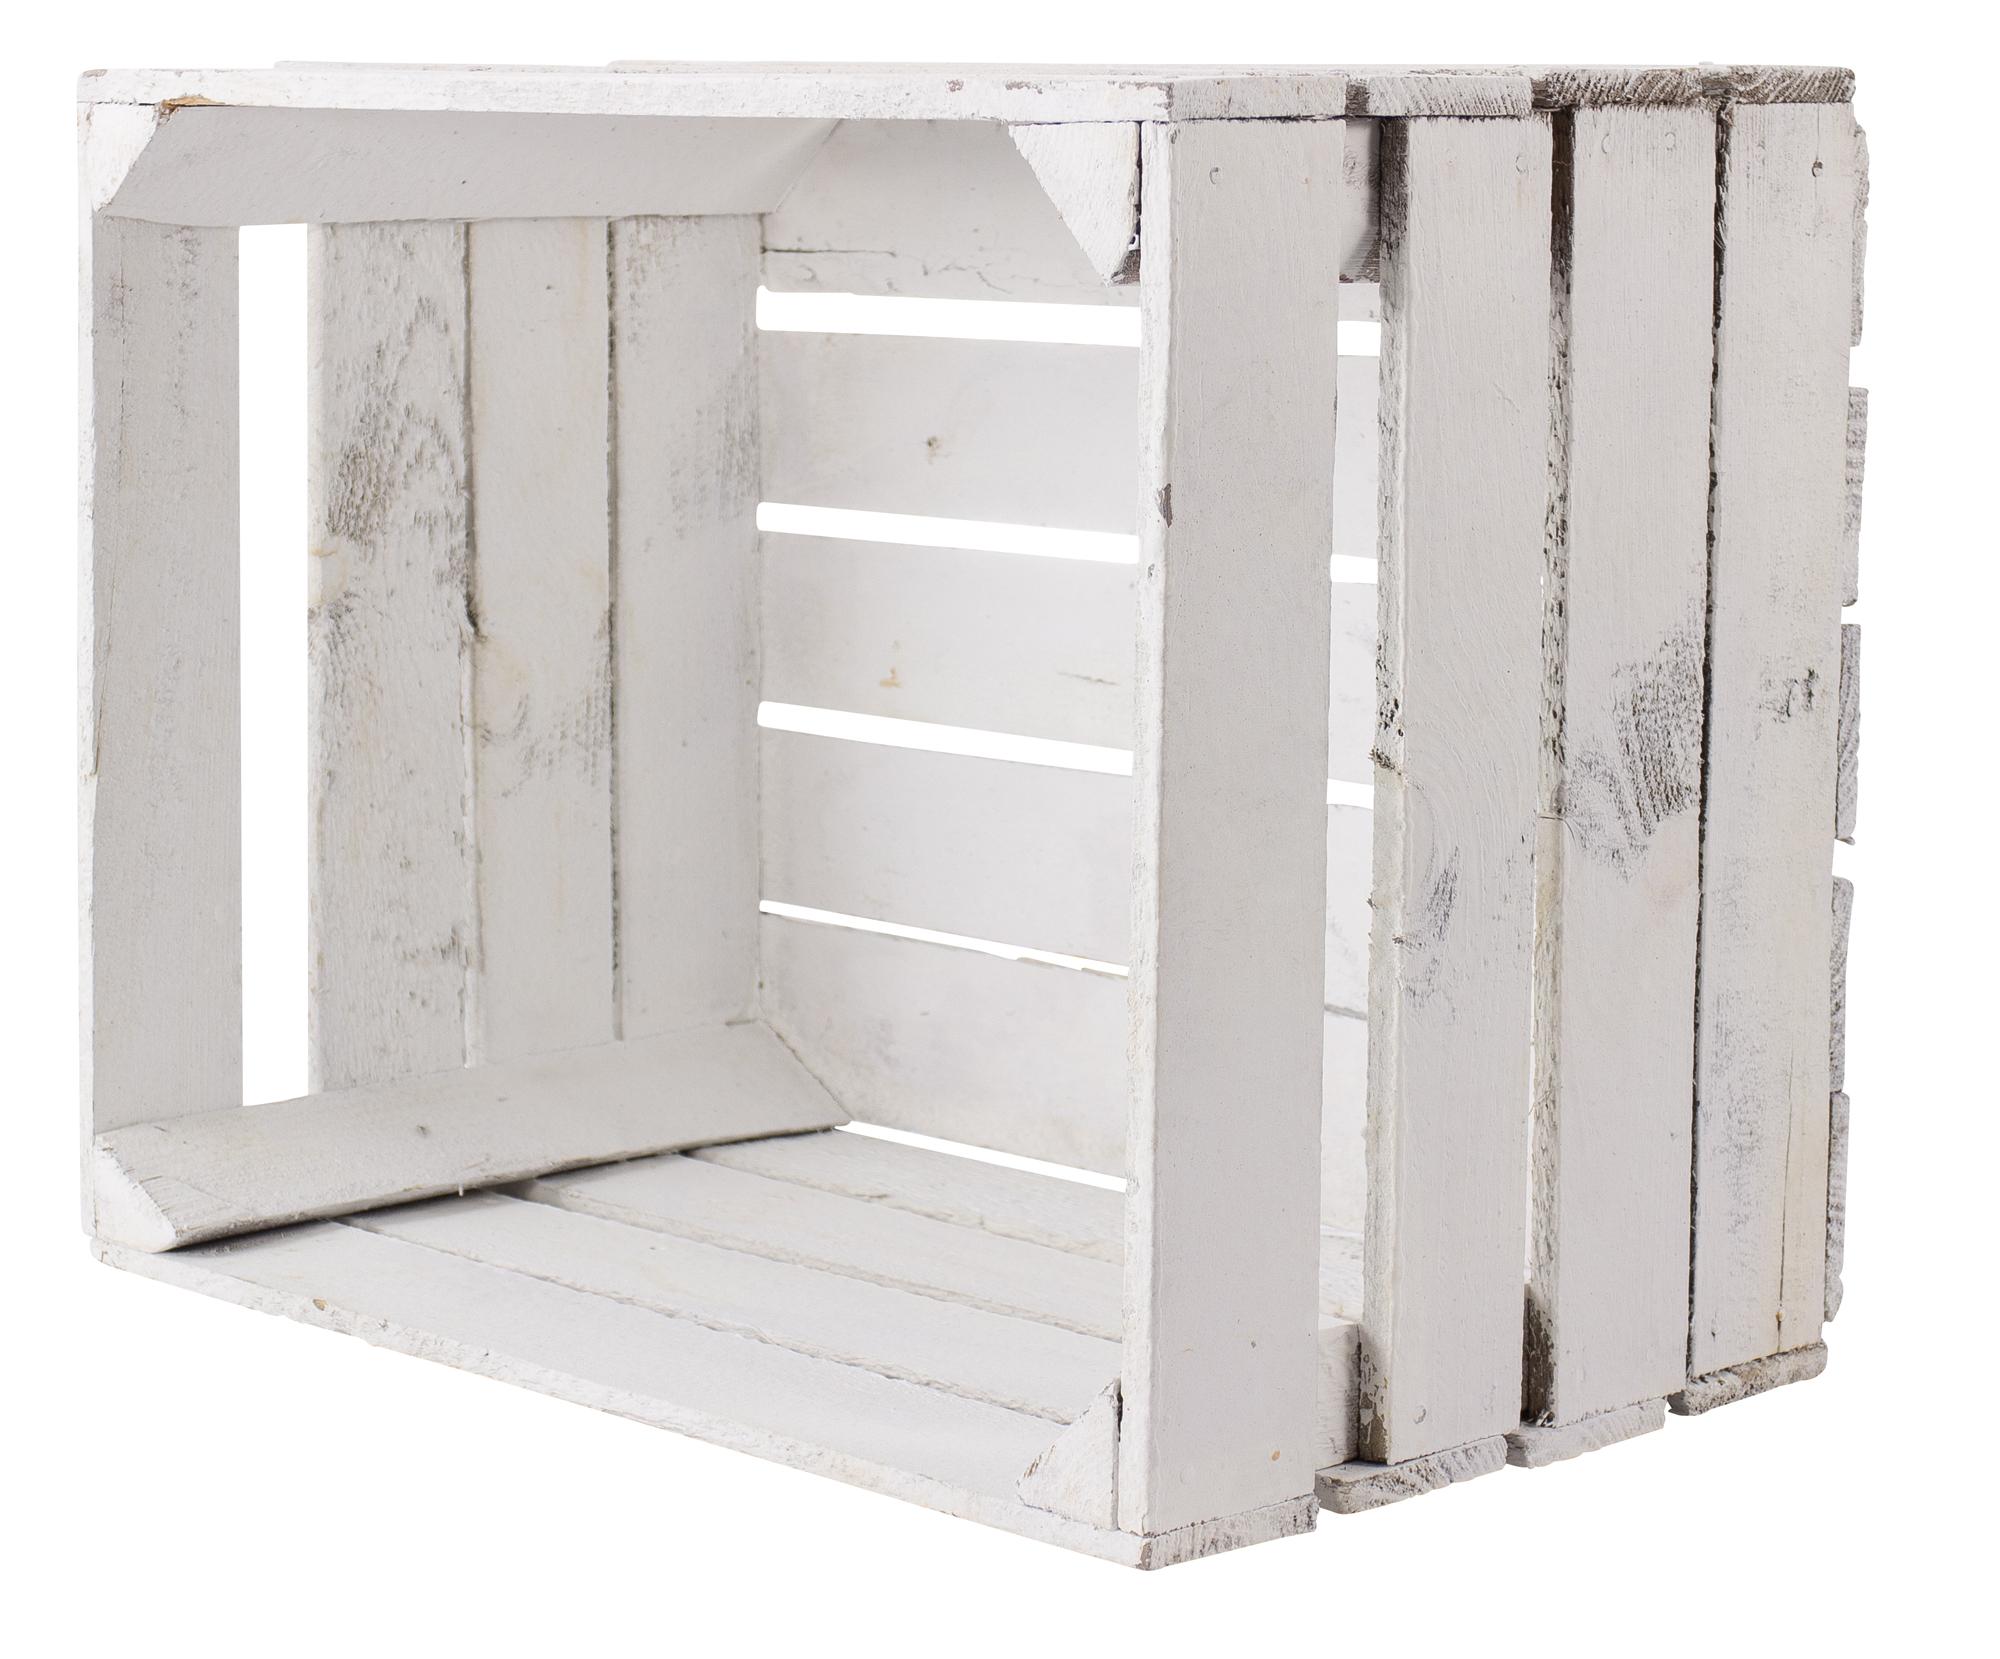 Alte weiße Holzkiste 50x40x30cm